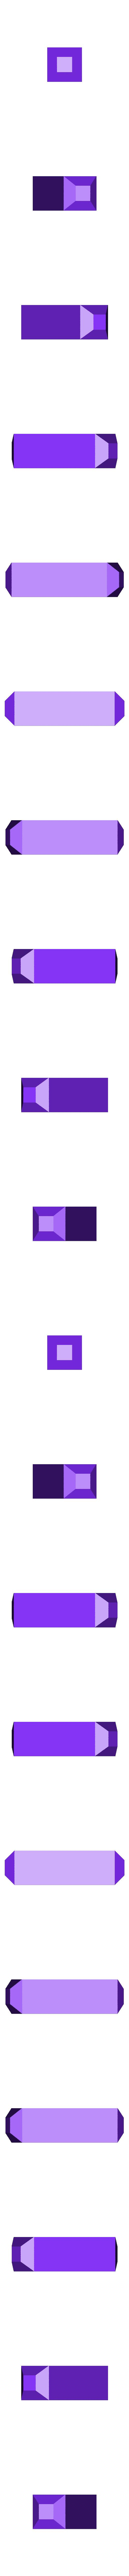 Case_Connector.stl Download free STL file Archimedes Screw Bonanza • 3D printer design, Urulysman